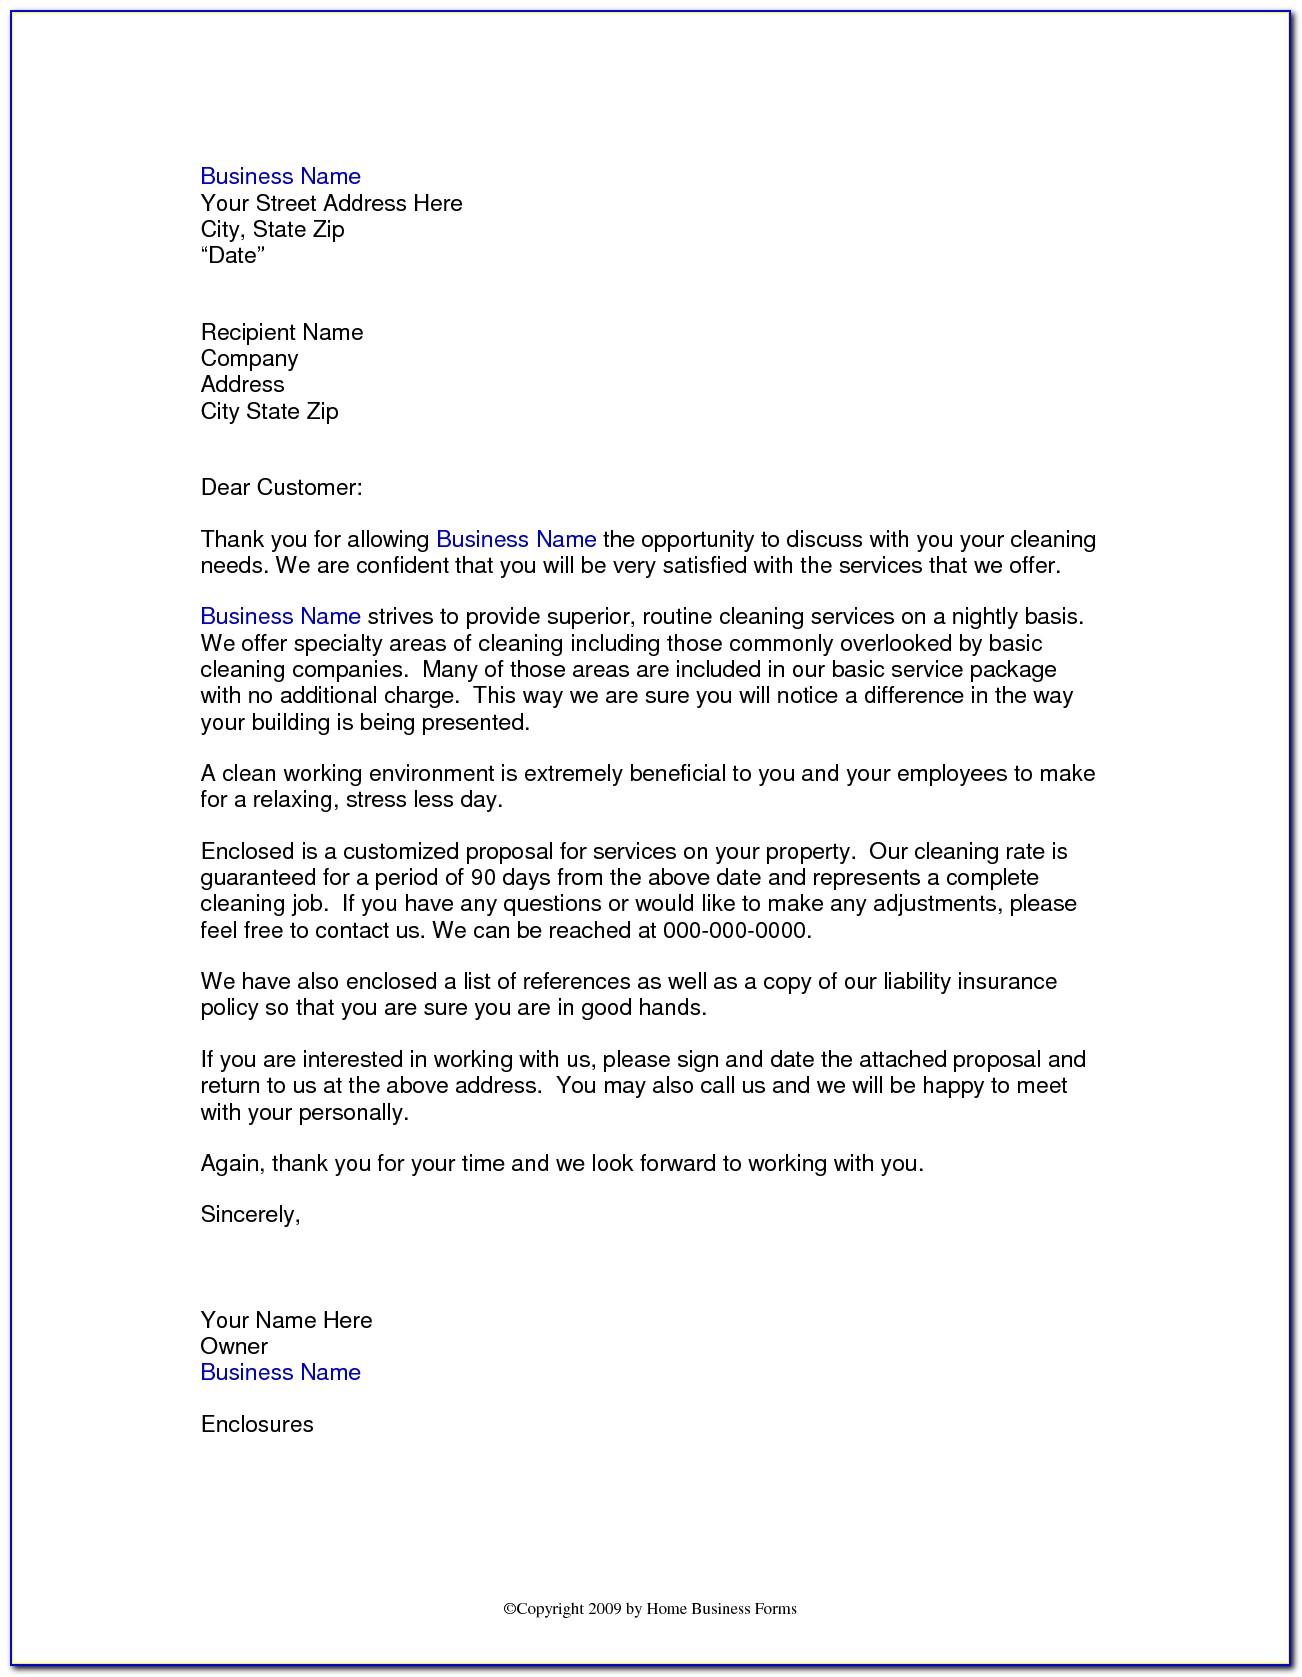 Sample Cover Letter For Tender Proposal